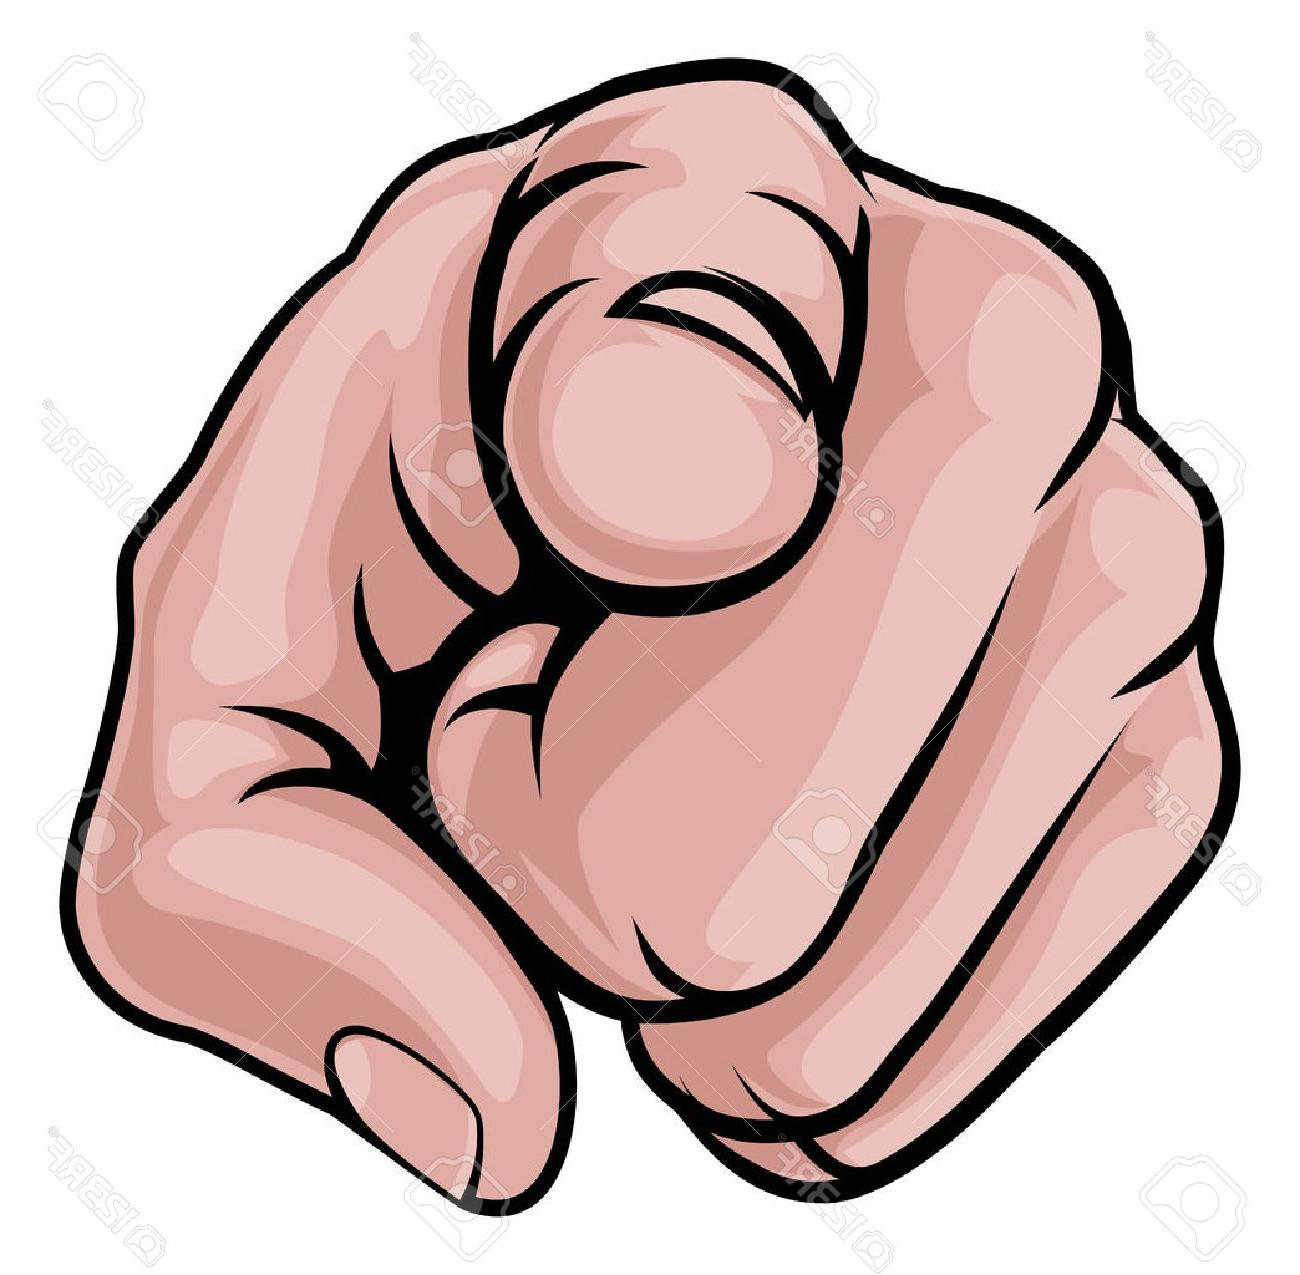 1300x1275 Hd Cartoon Pointing Finger Meme Vector Image Free Vector Art